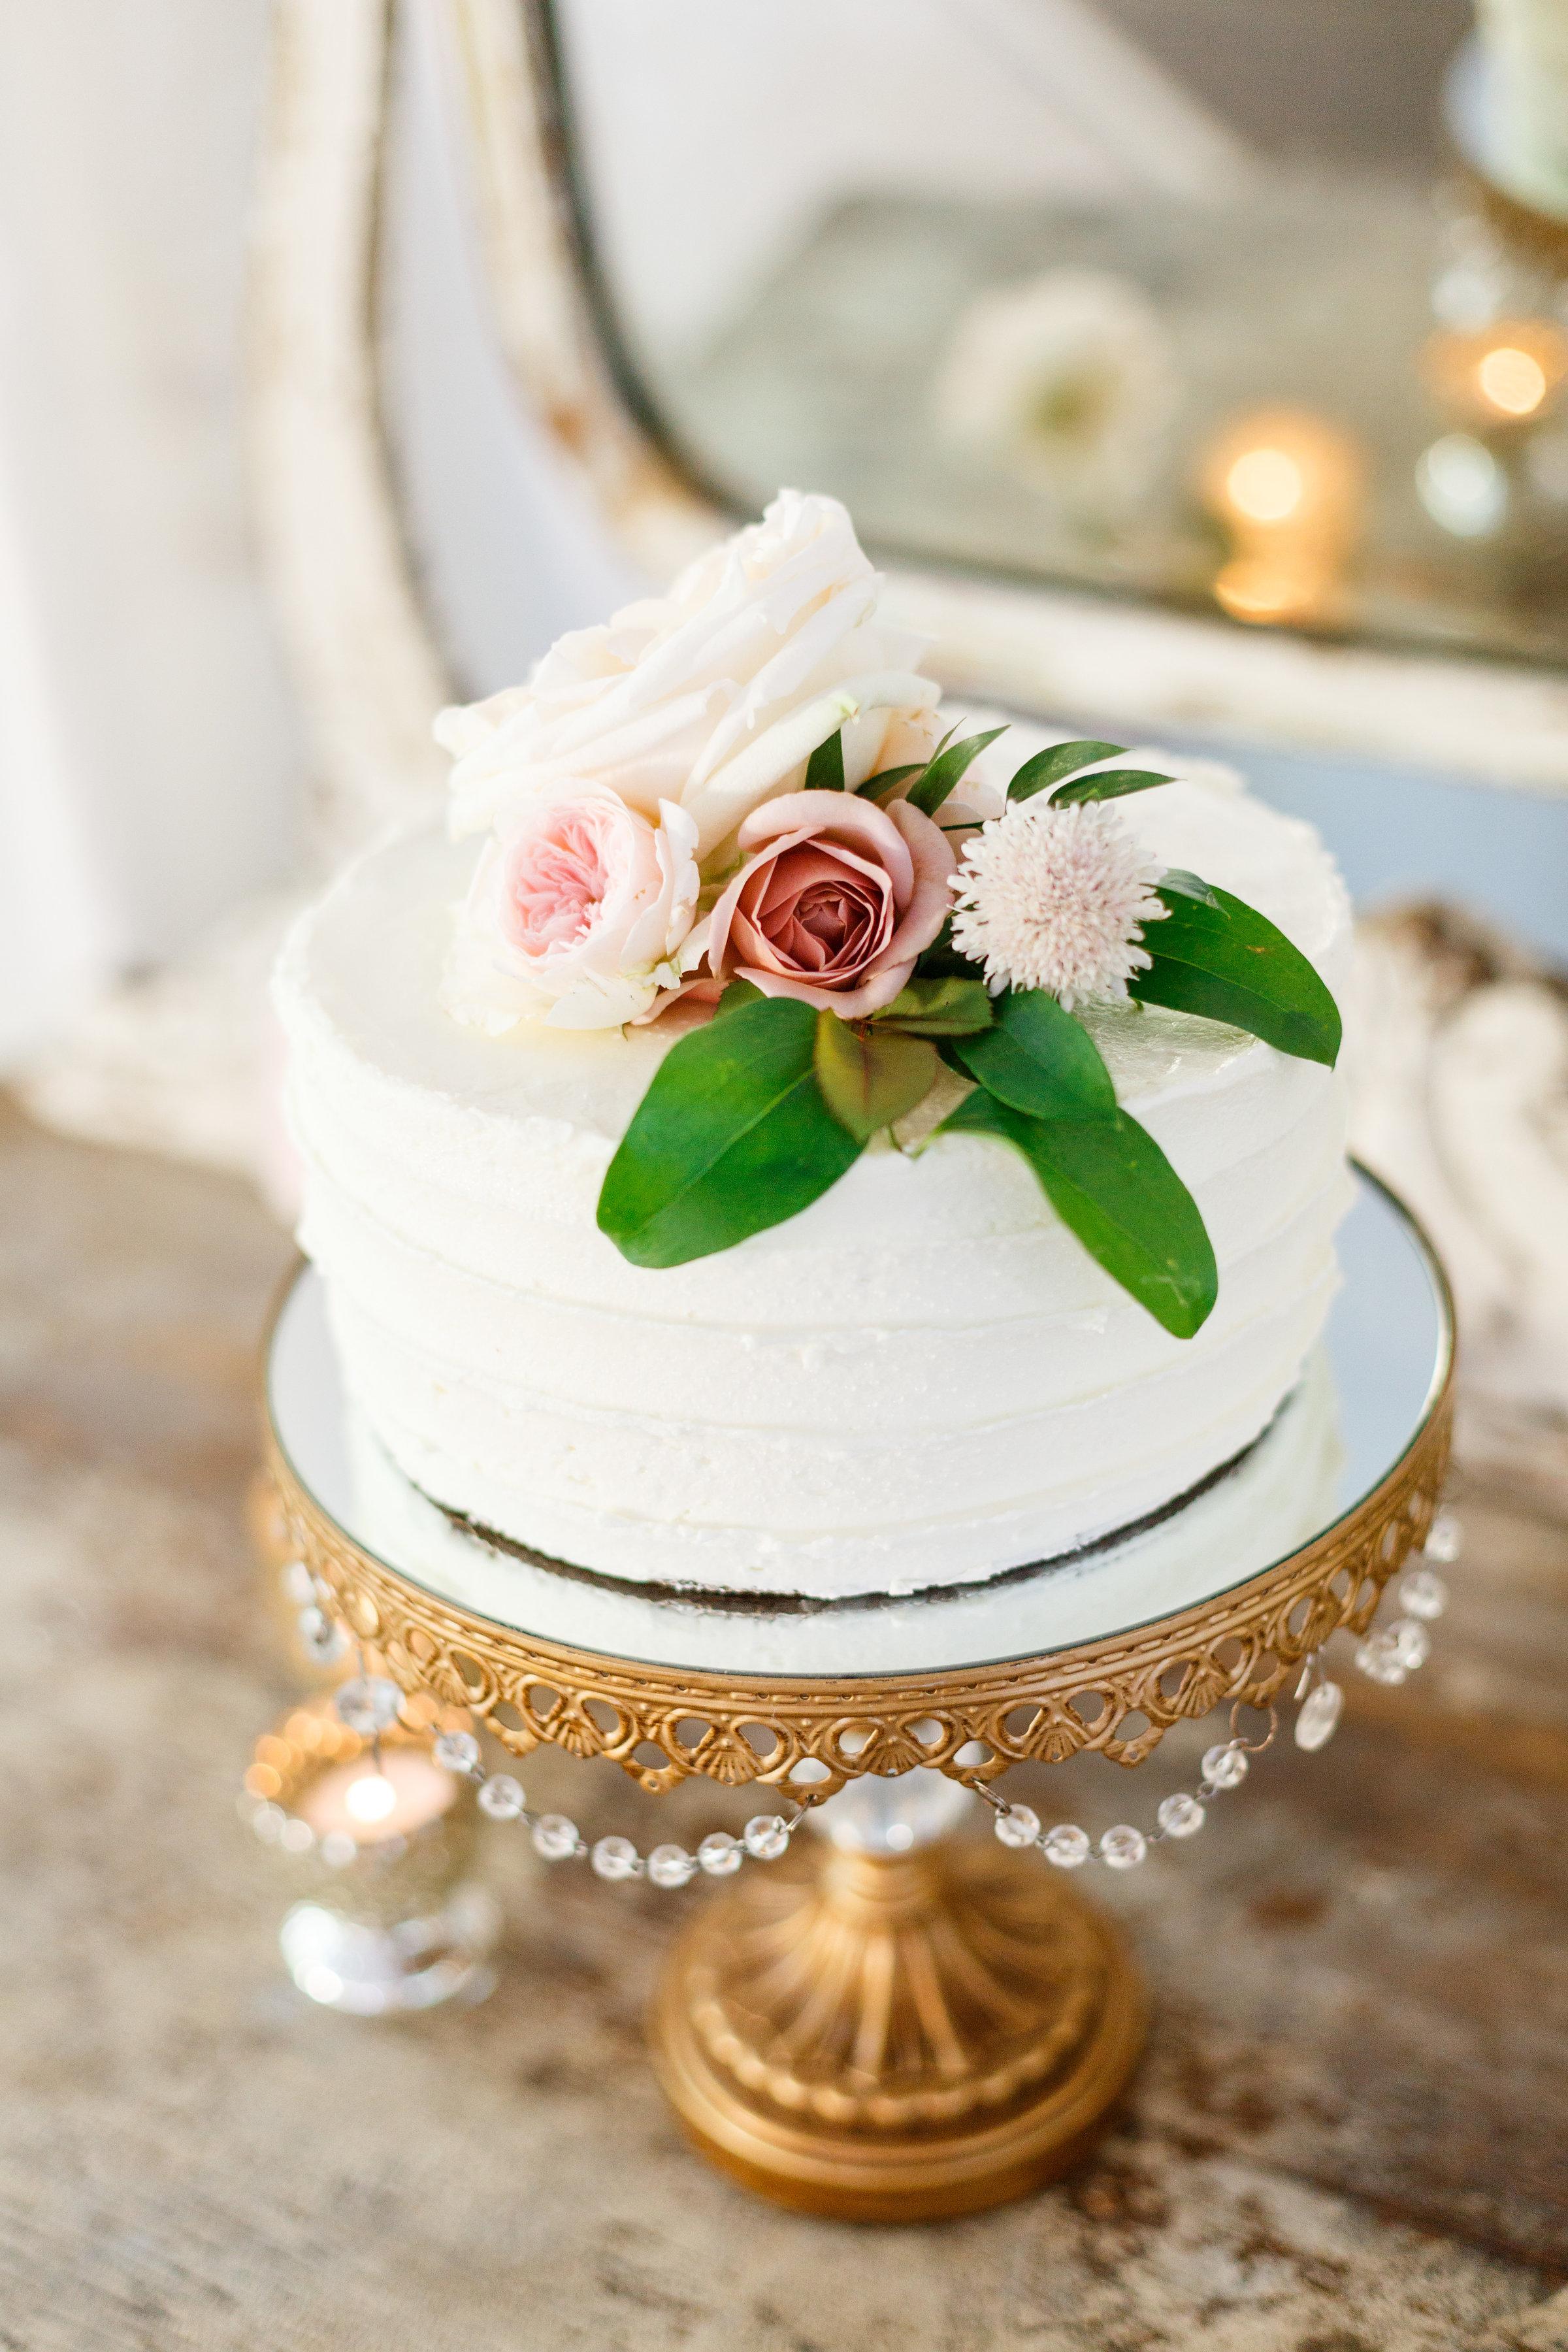 Cake Flowers 2.jpg